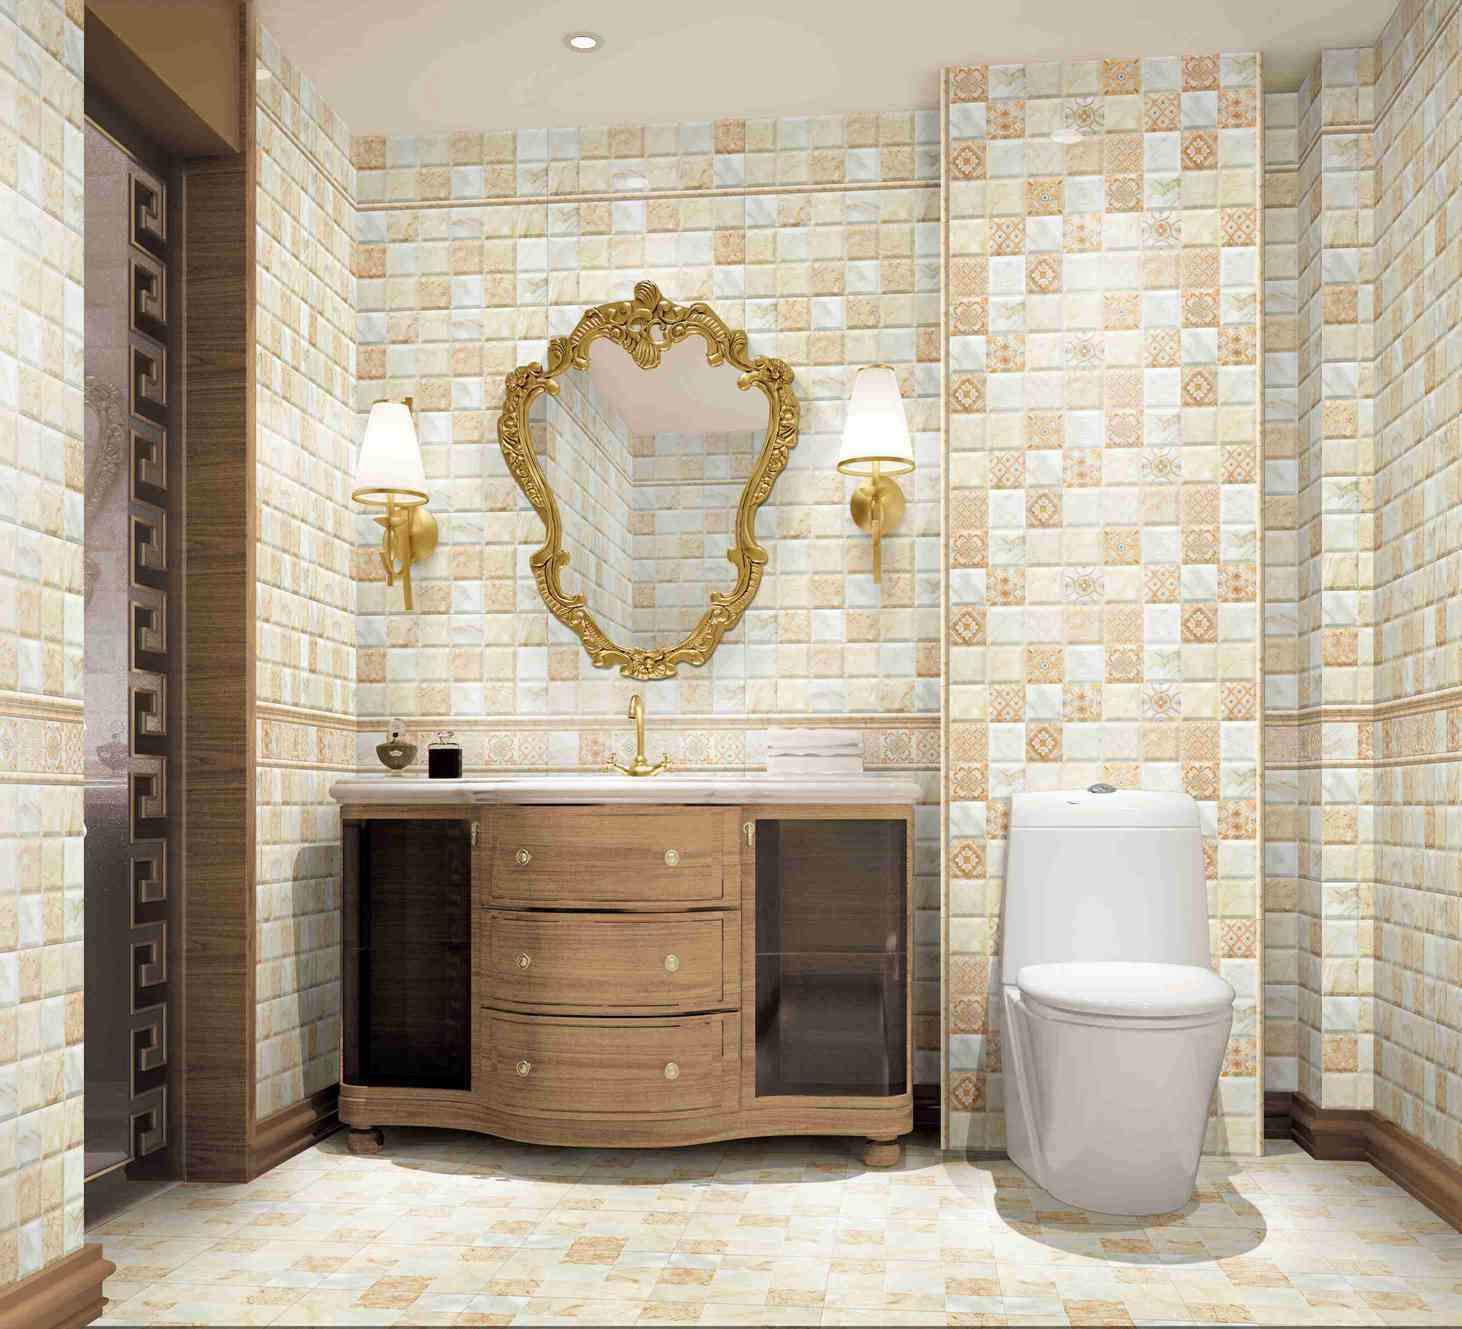 2016 nuovo glazed ceramic wall tile per kitchen bathroom - Leroy merlin azulejos cocina ...